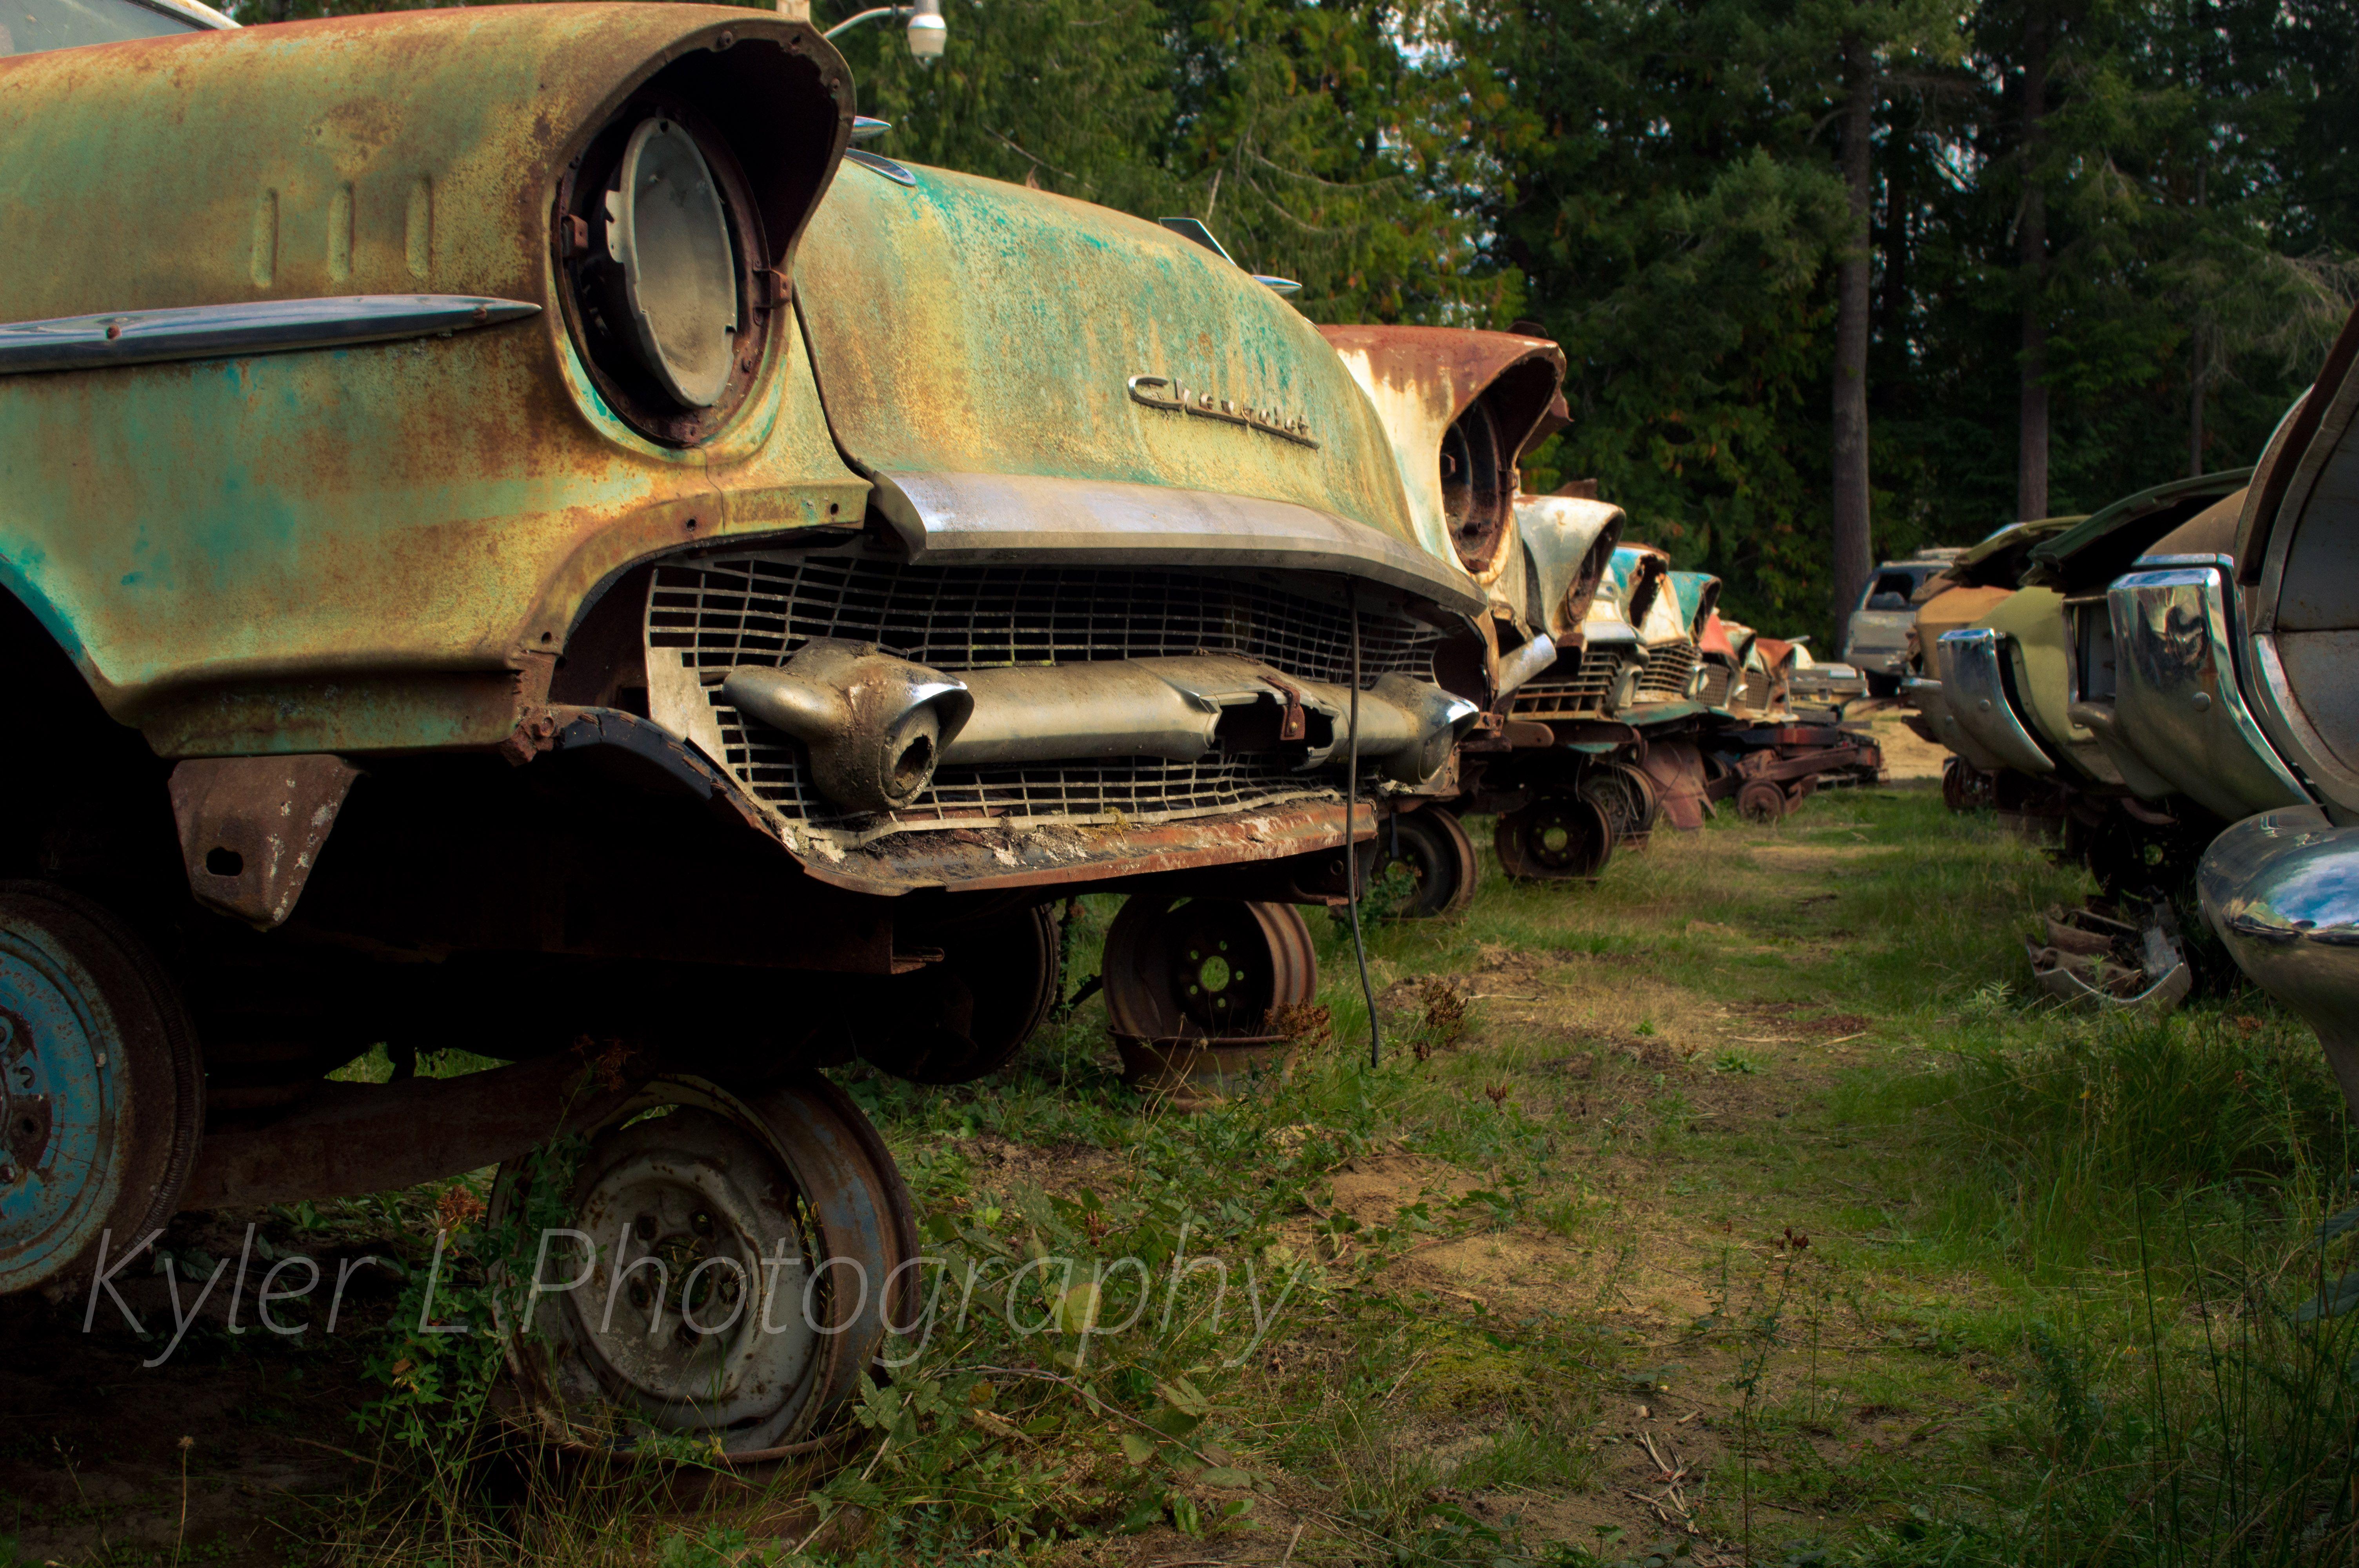 Old cars at a wrecking yard in Northwestern Washington